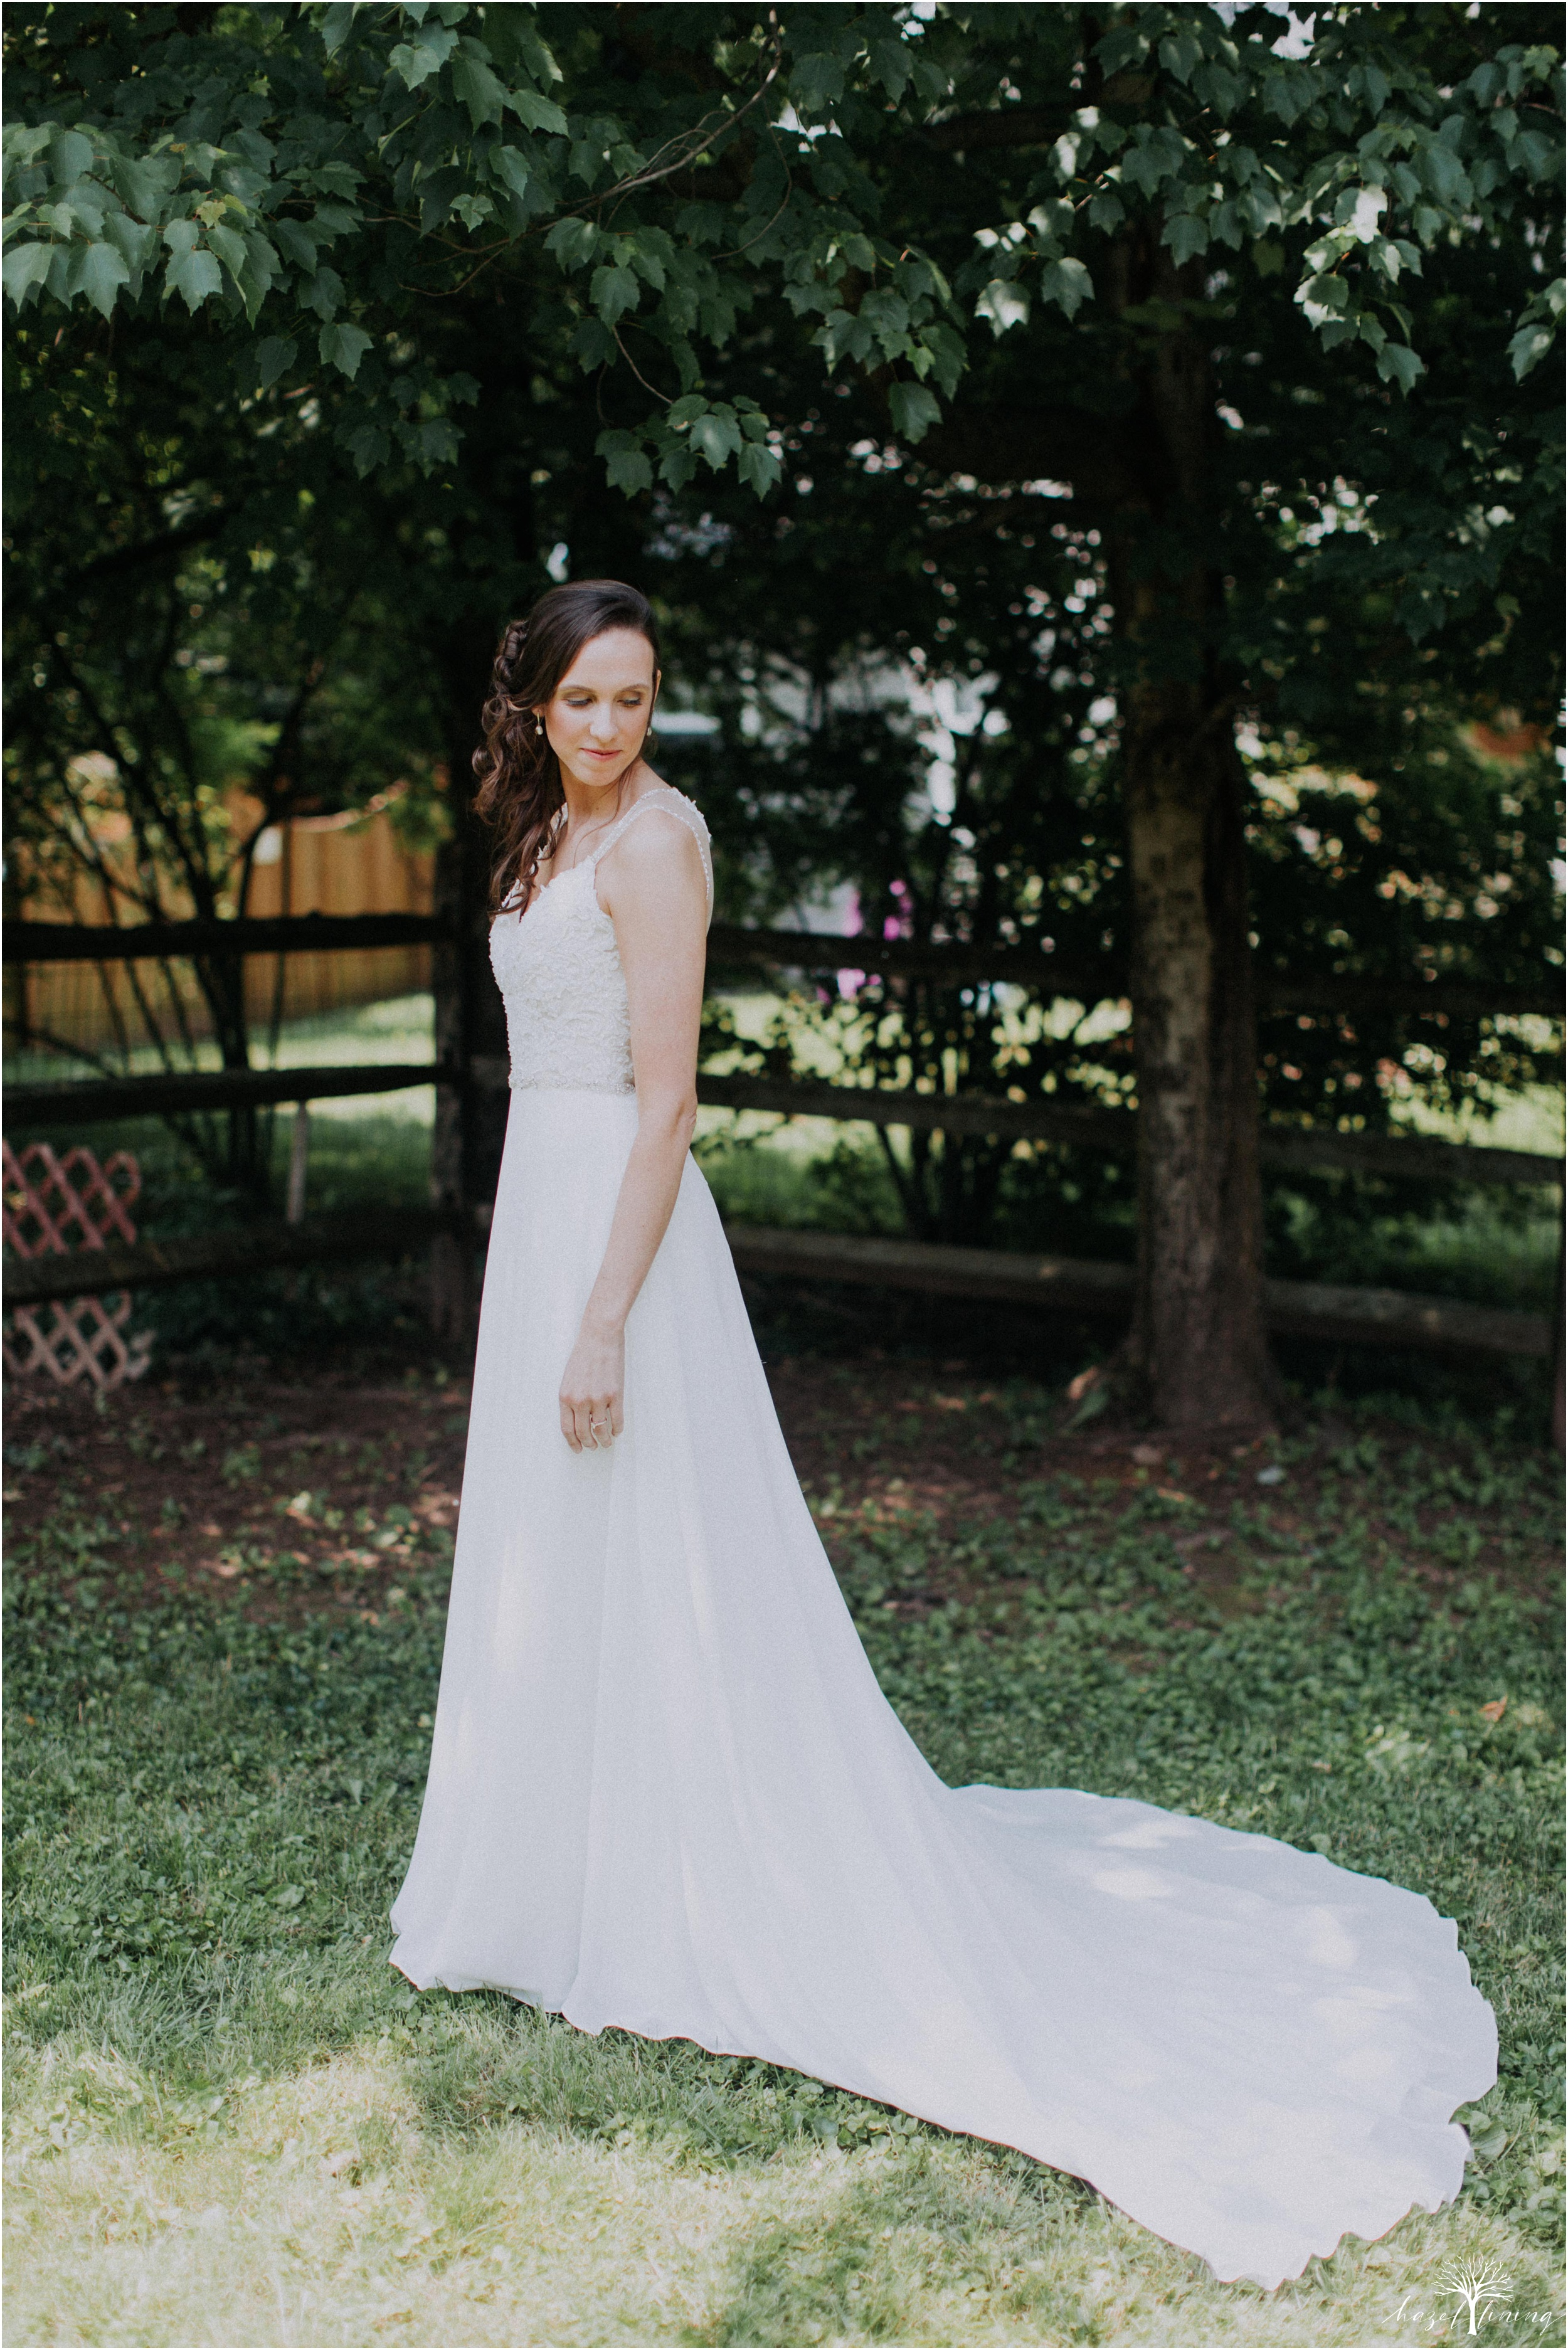 hazel-lining-travel-wedding-elopement-photography_0028.jpg